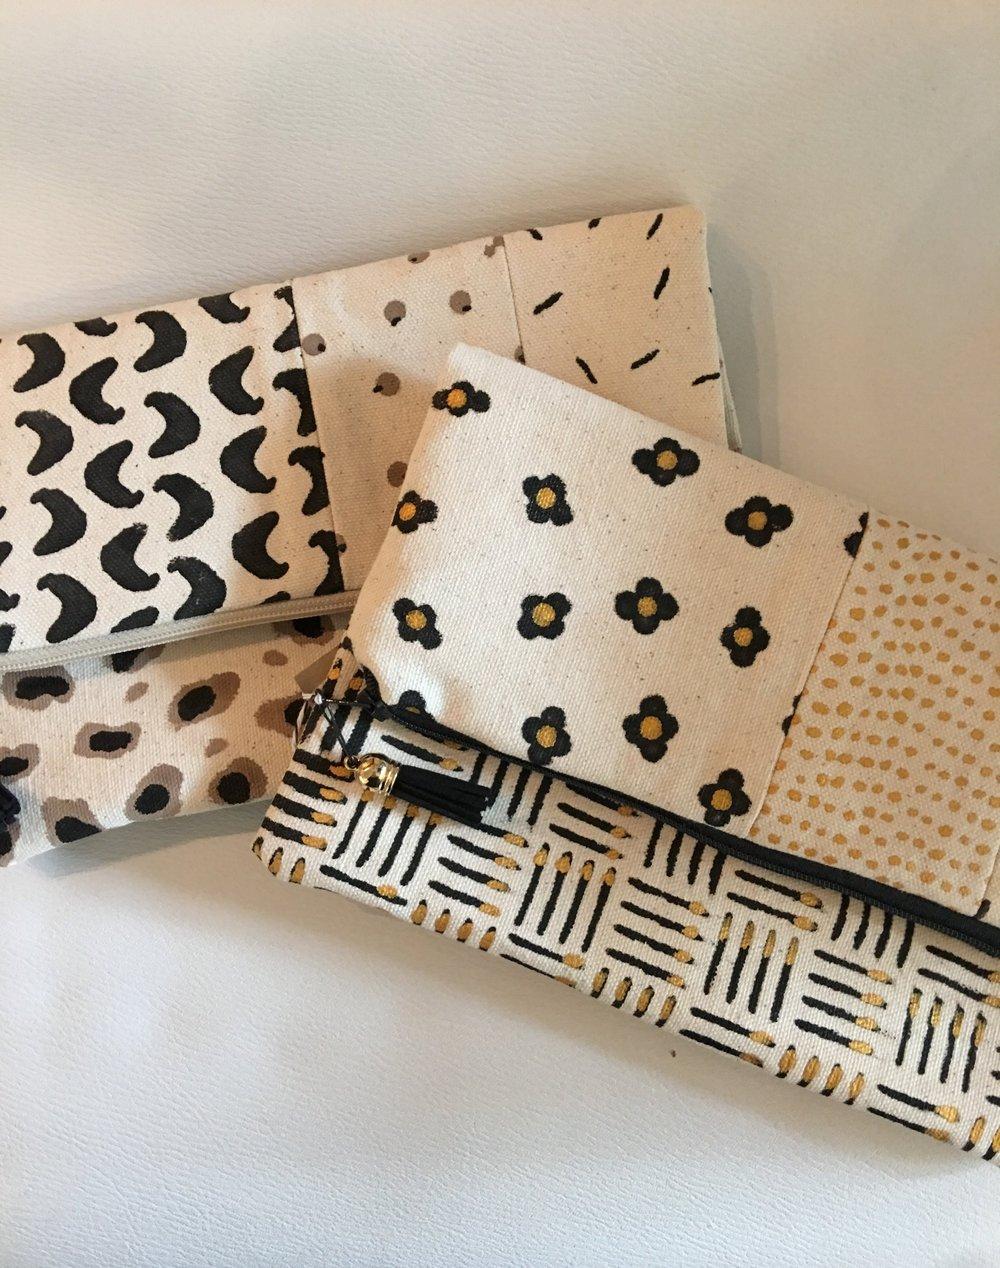 Clutch Handbags by Shelly Koltookian